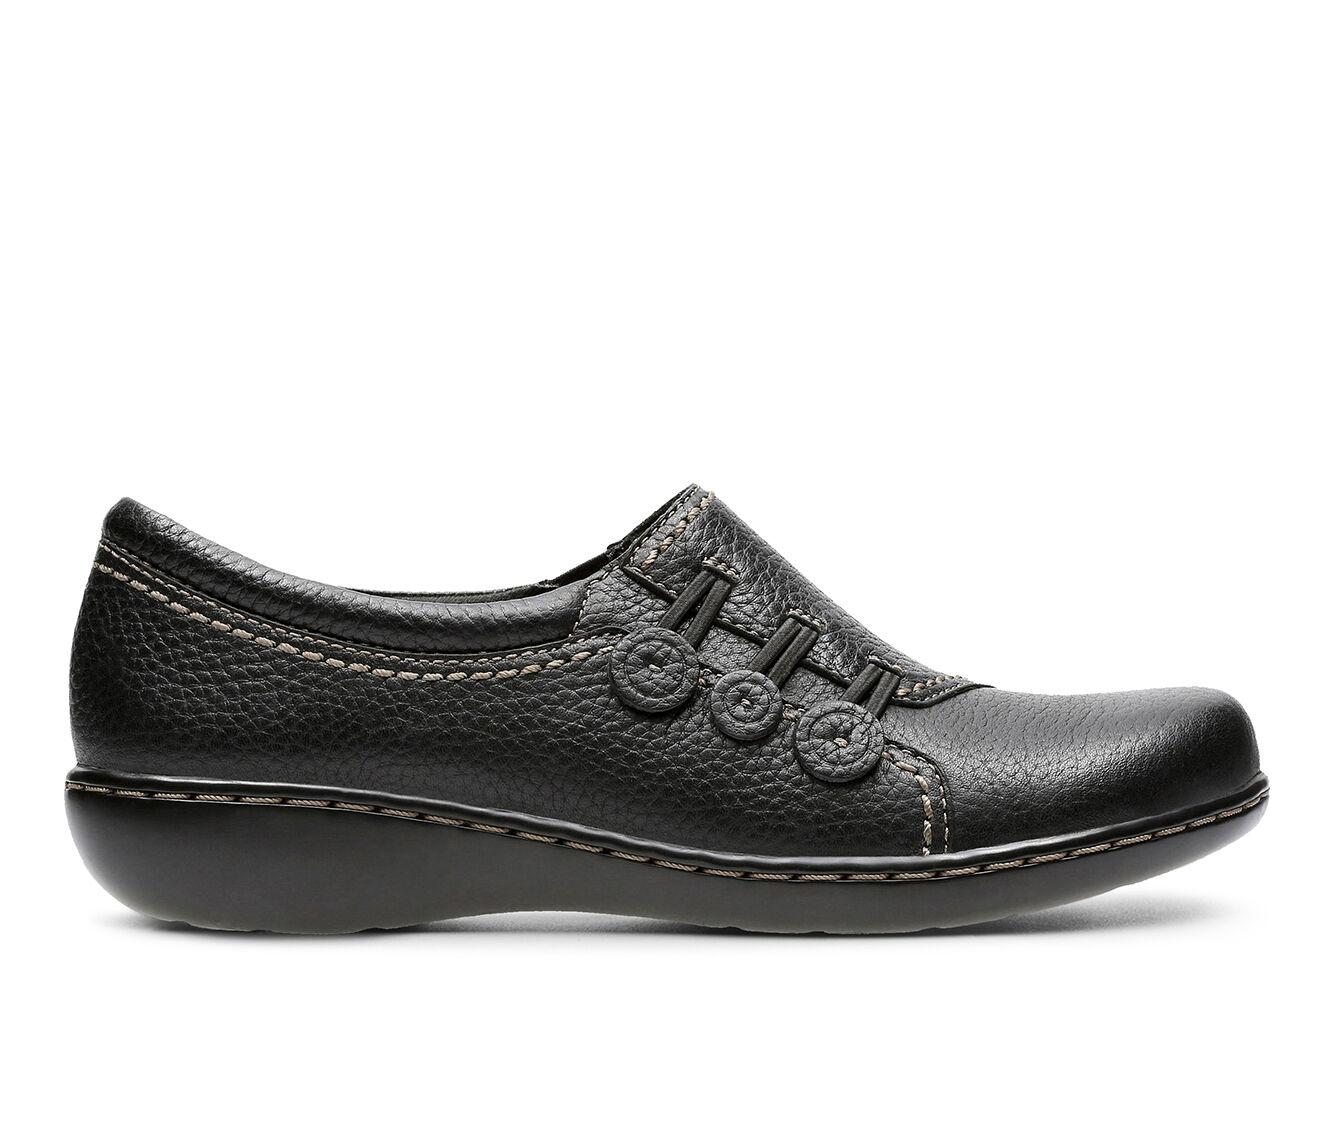 Women's Clarks Ashland Effie Black Leather